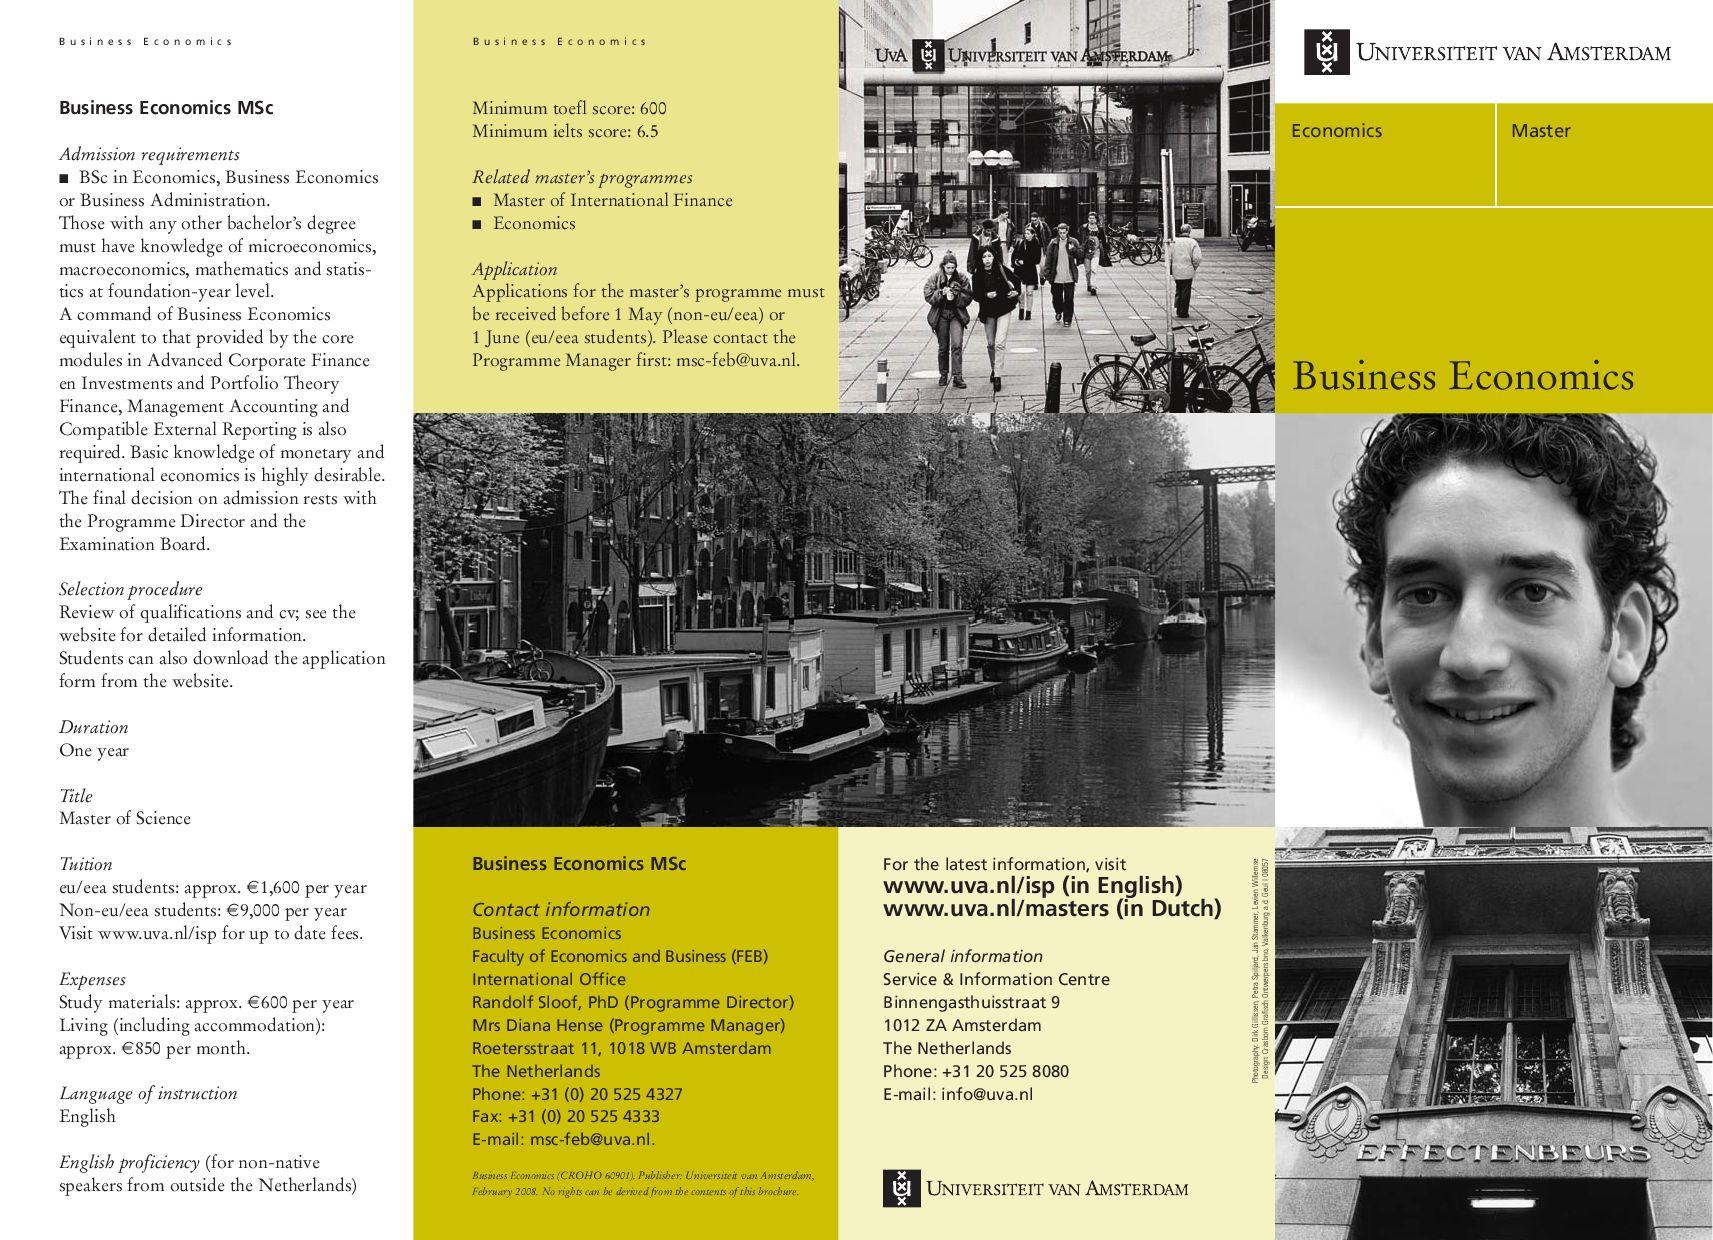 UVA FEB Master Business Econimics by University of Amsterdam, FEB